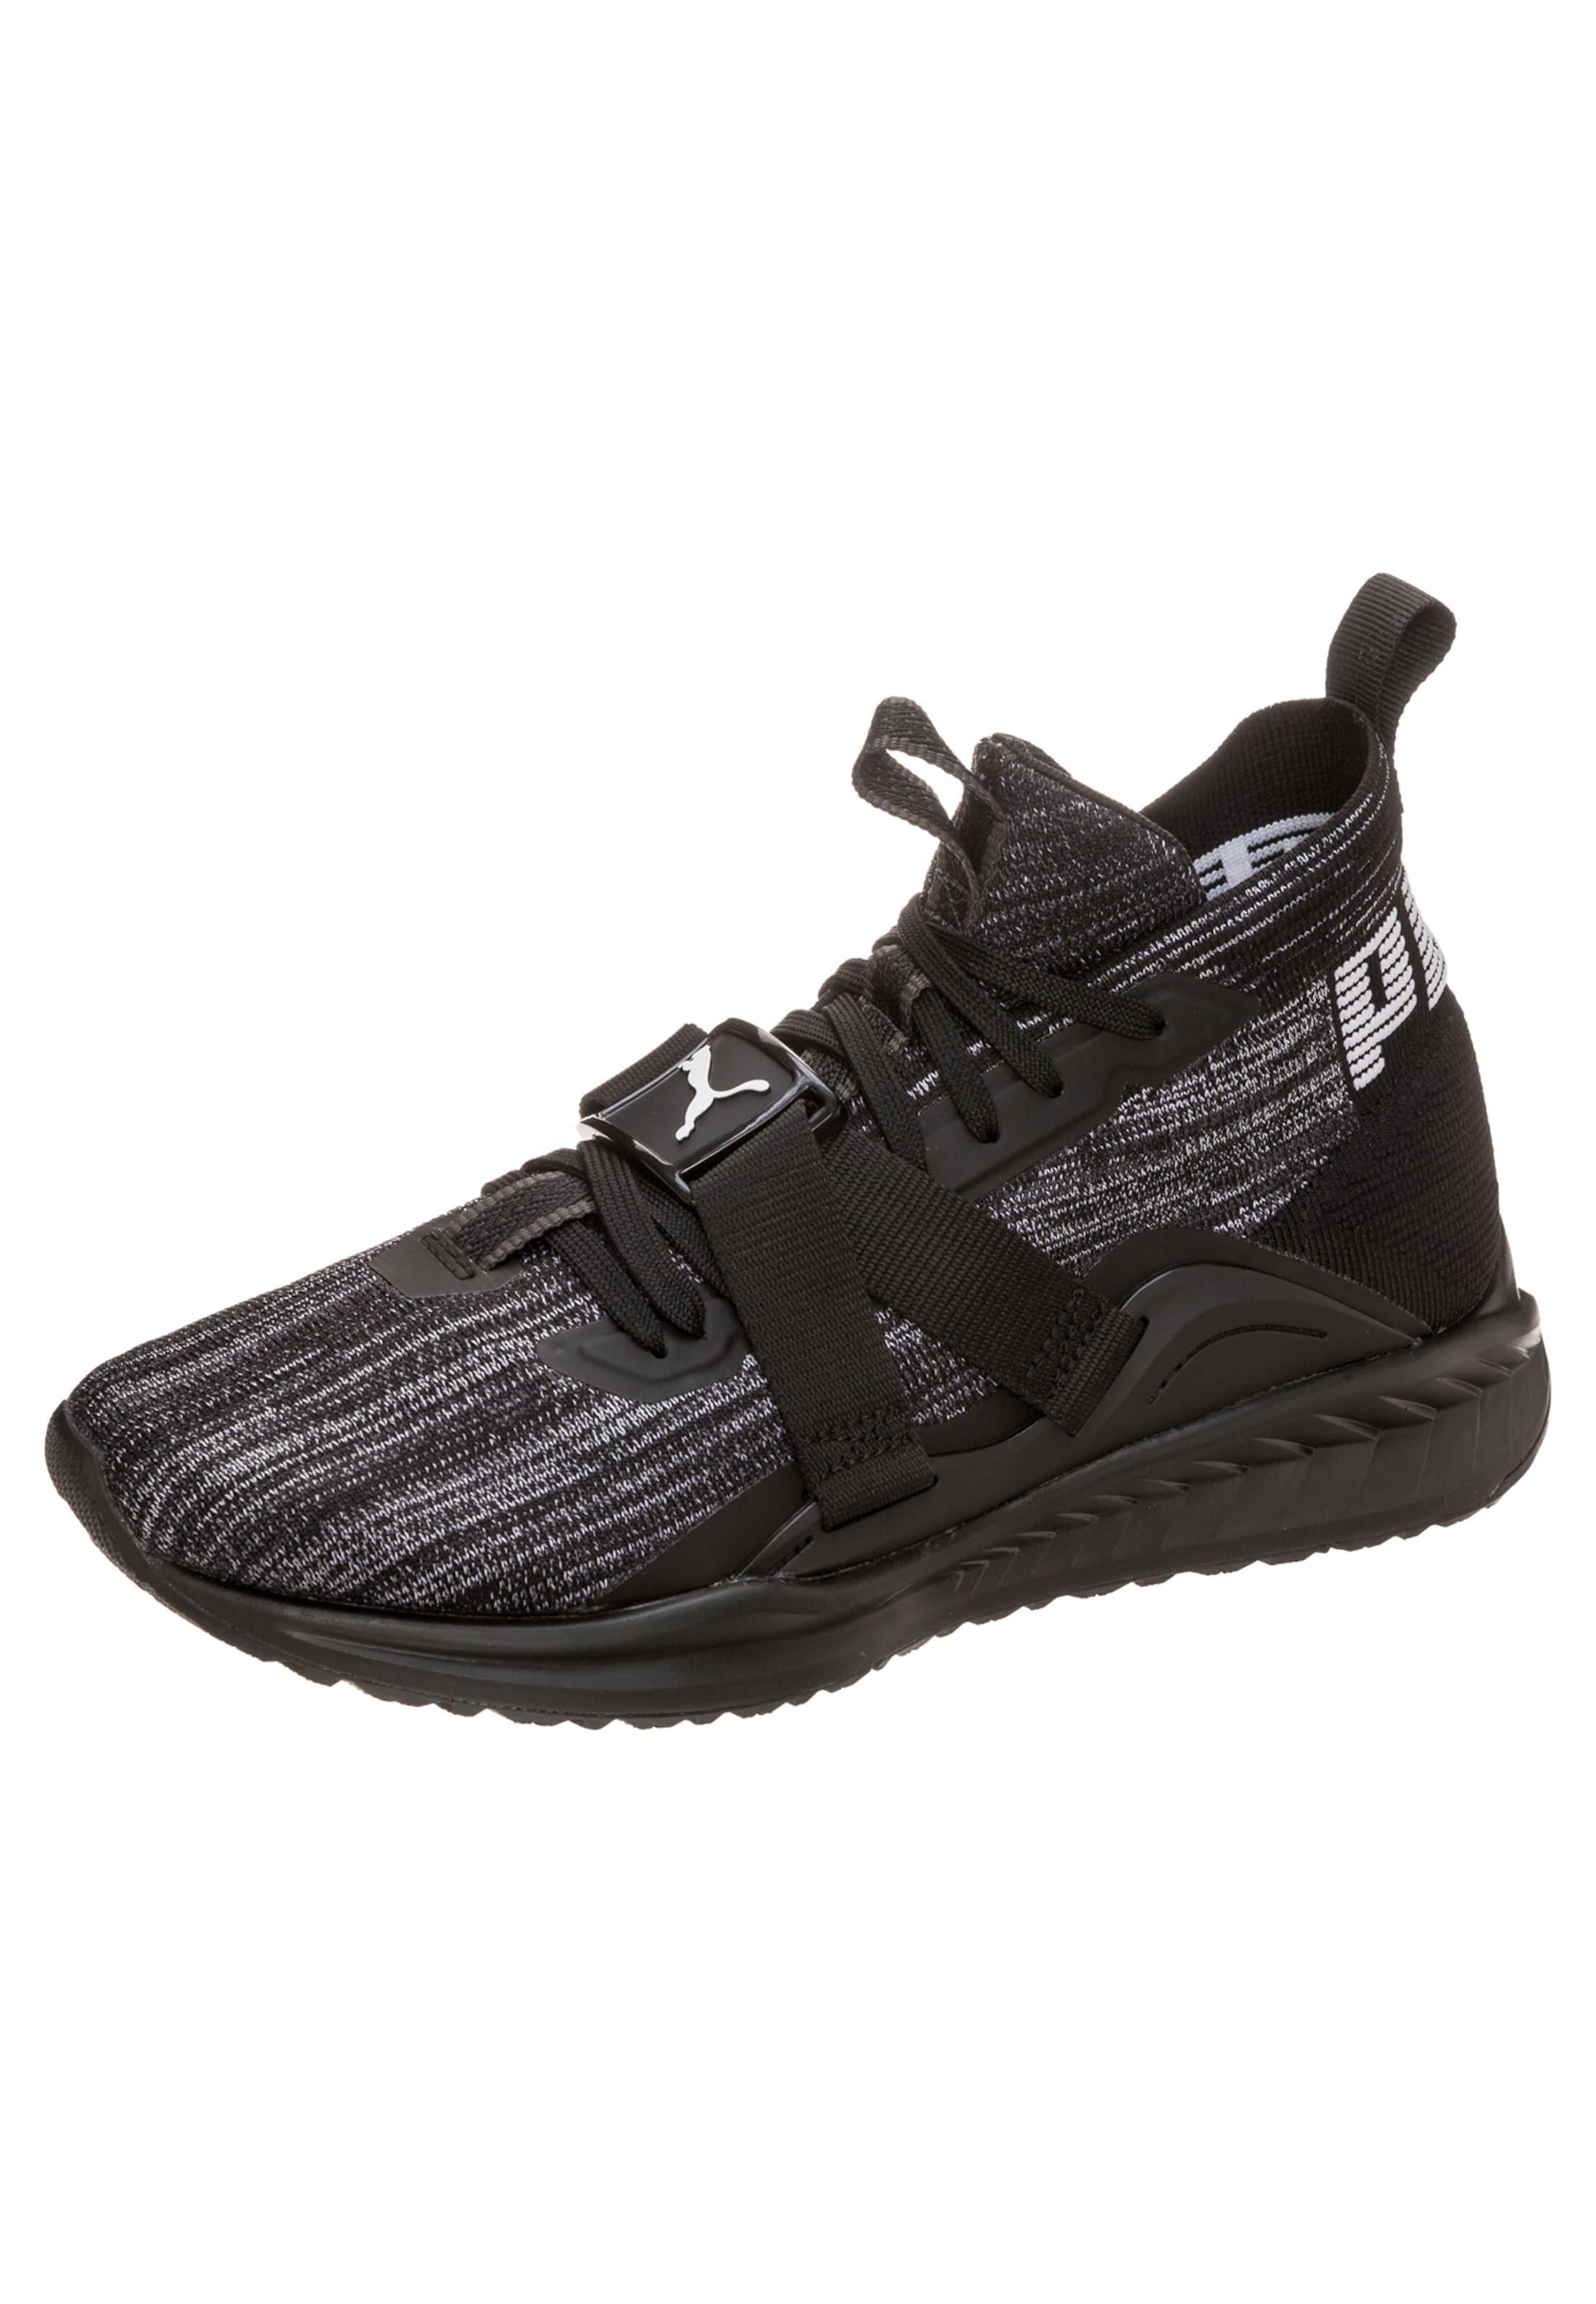 PUMA Sneaker Ignite evoKNIT 2 Hohe Qualität